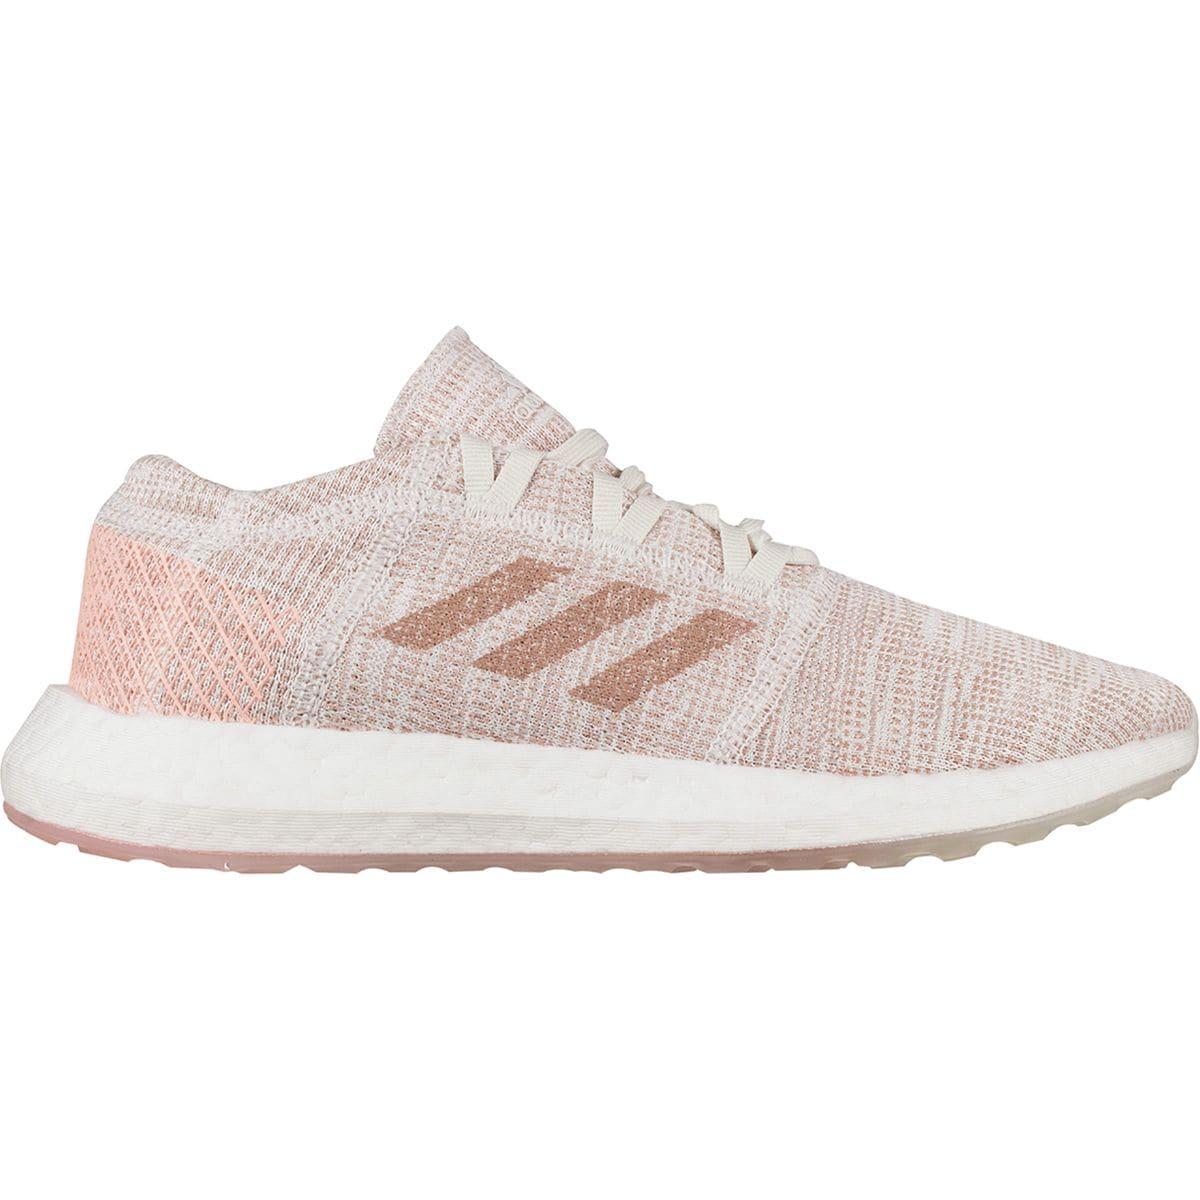 Adidas Pureboost Go Running Shoe Womens